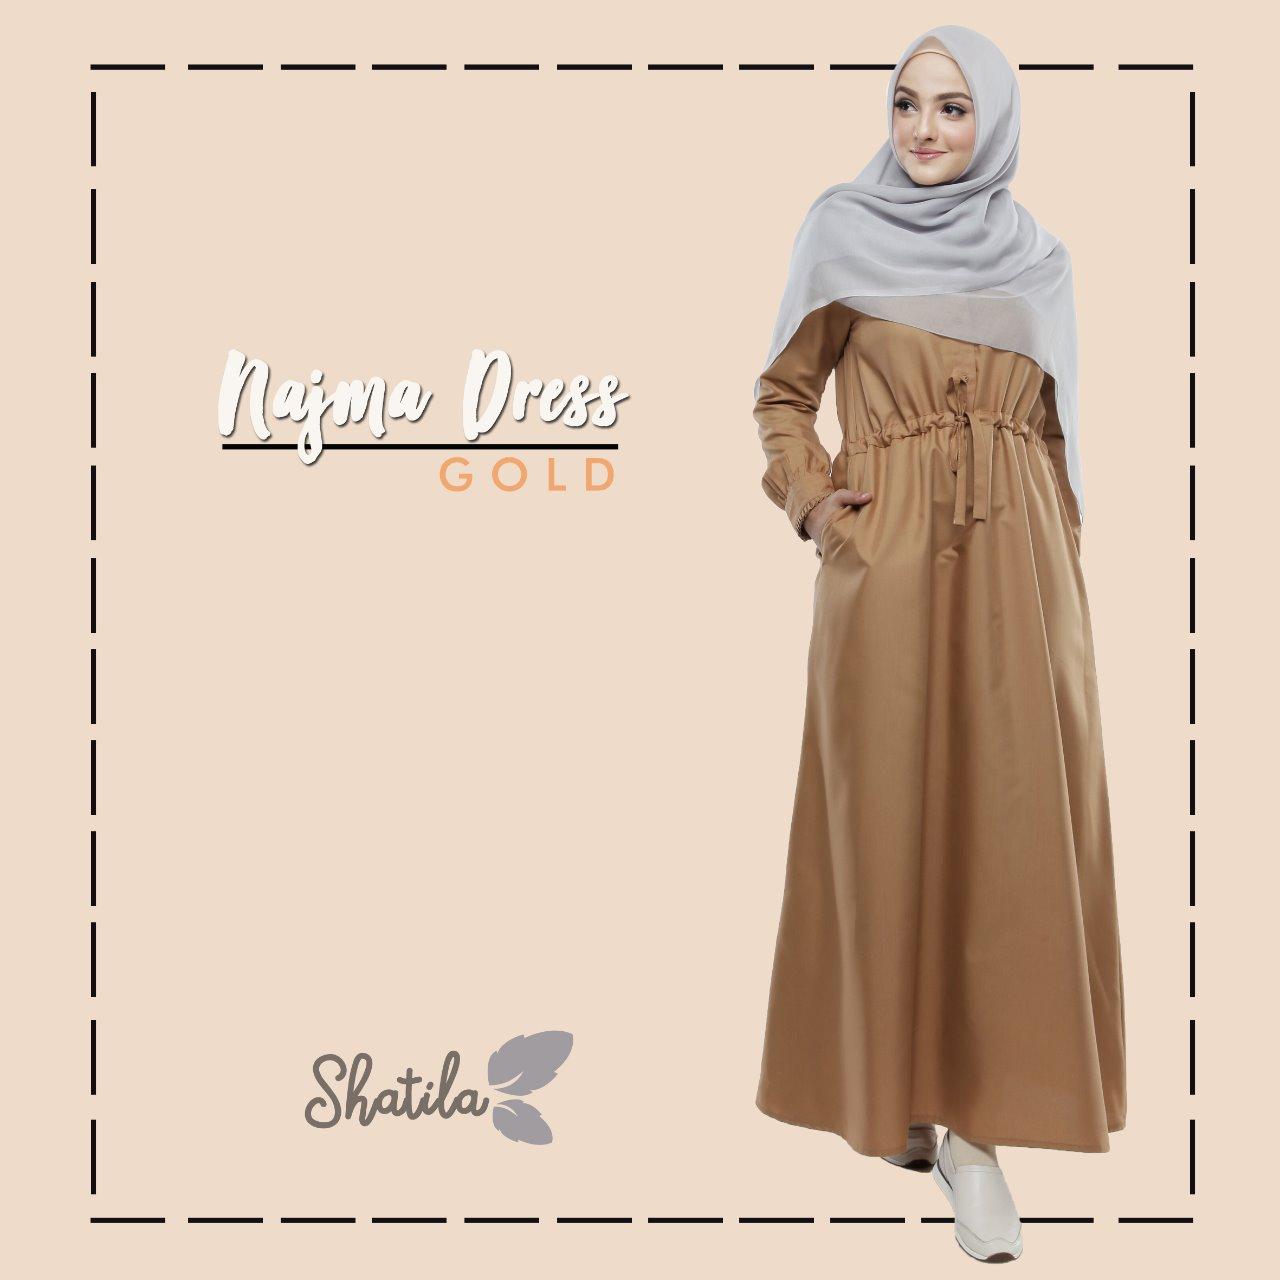 Grosir Dress Muslimah Gaul